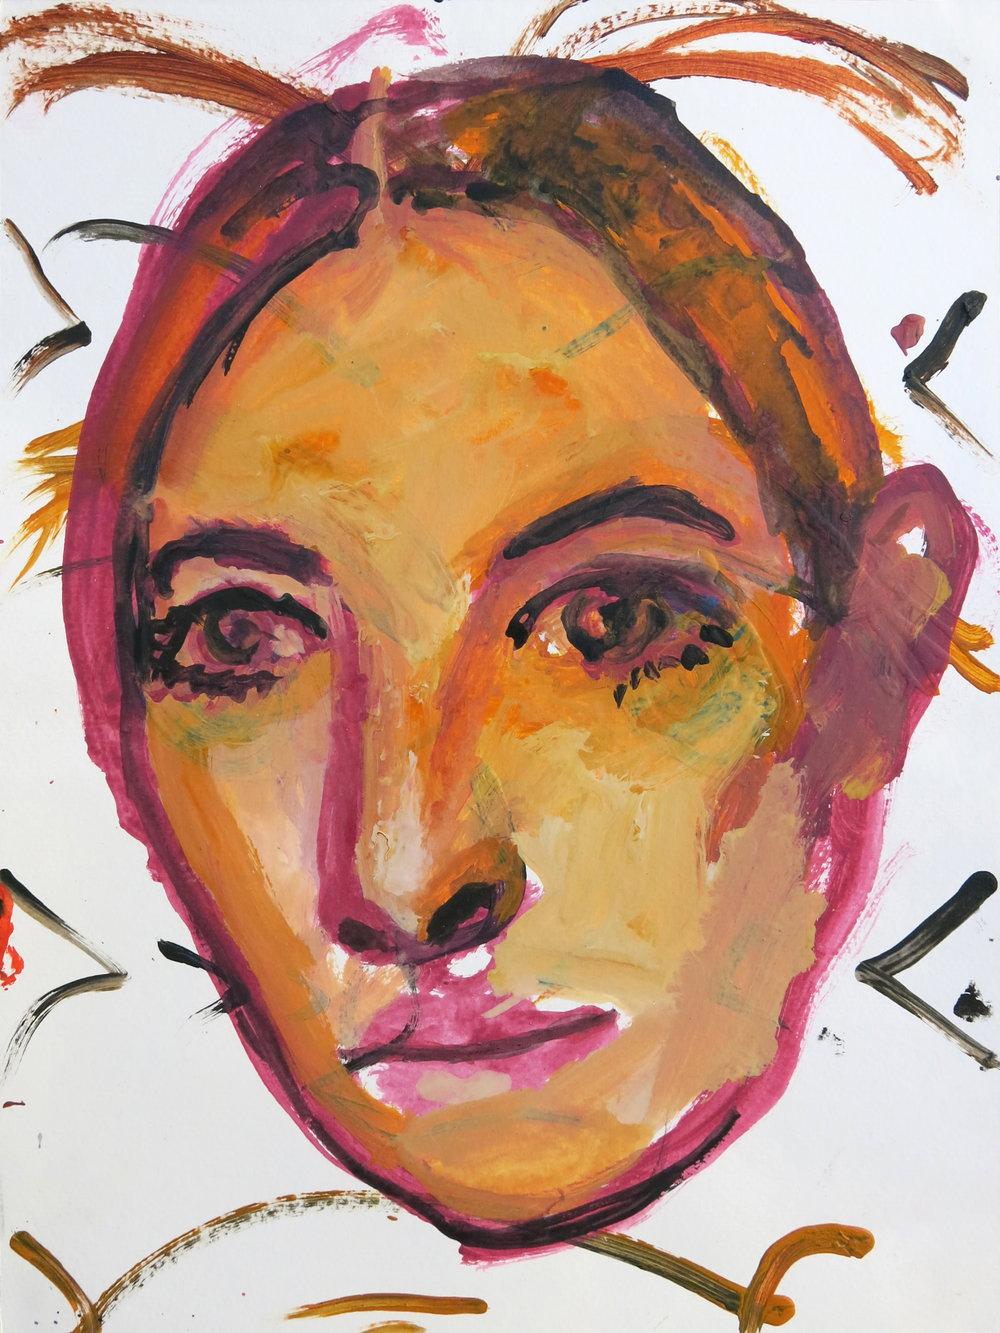 Barbra Streisand Portrait #5